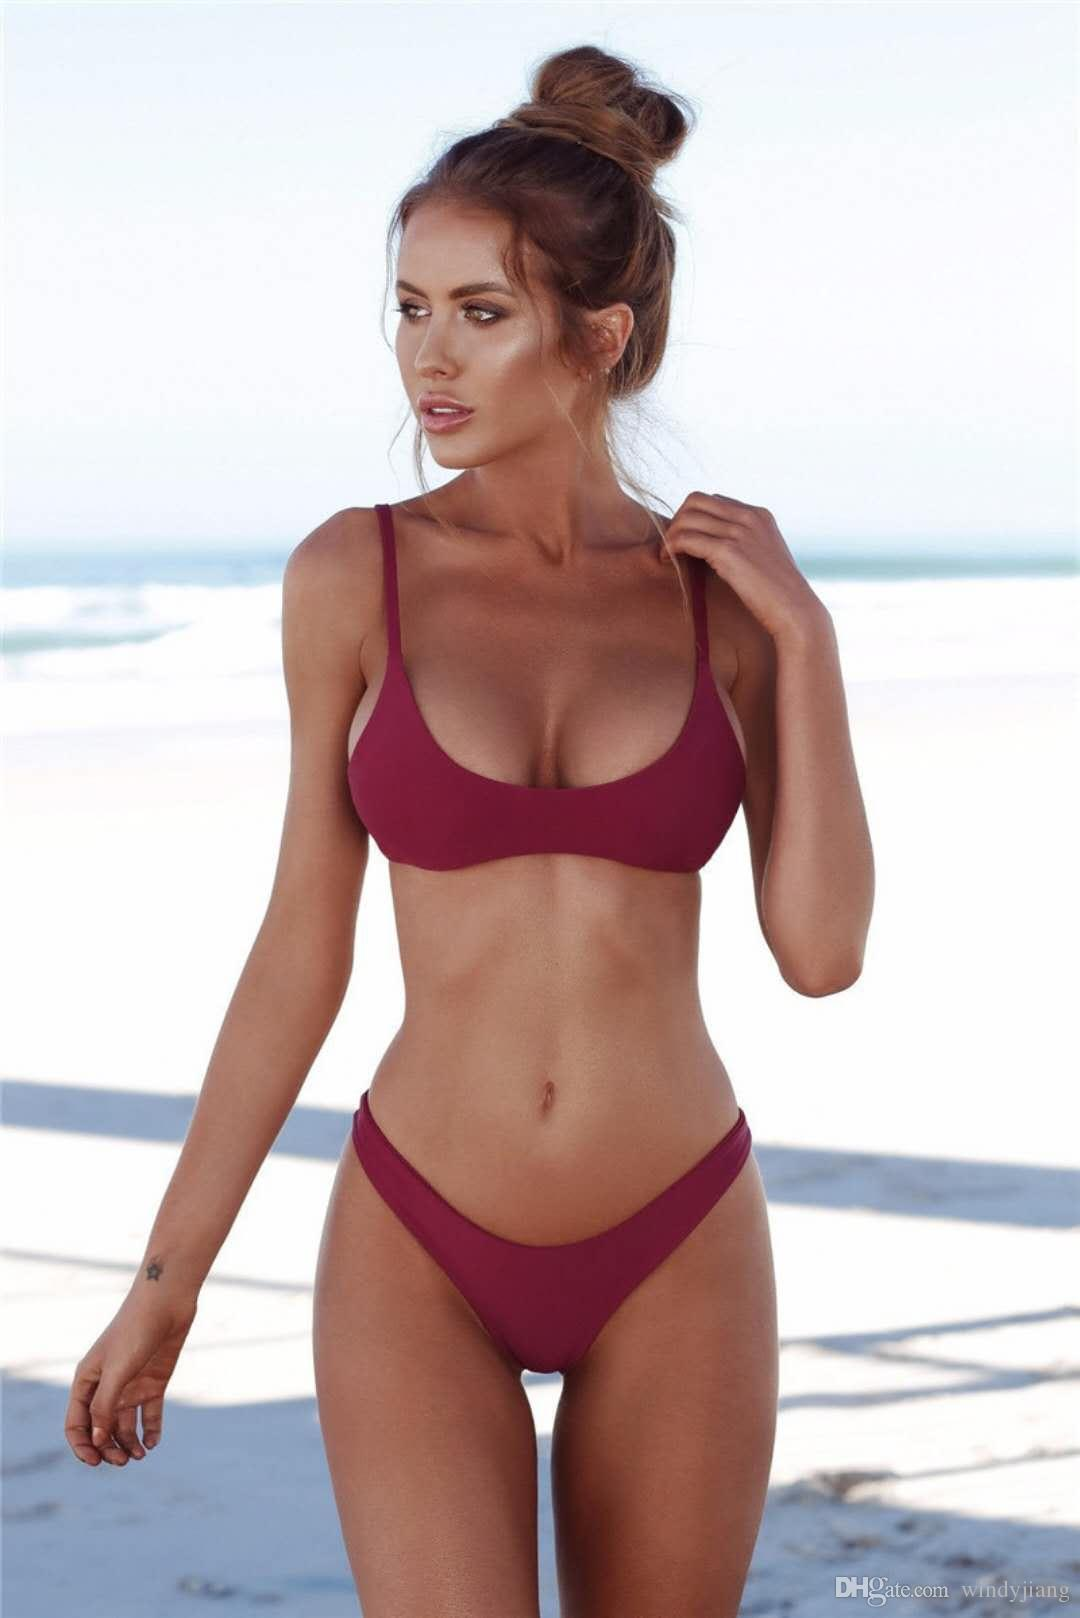 Hot swimsuit bikini model